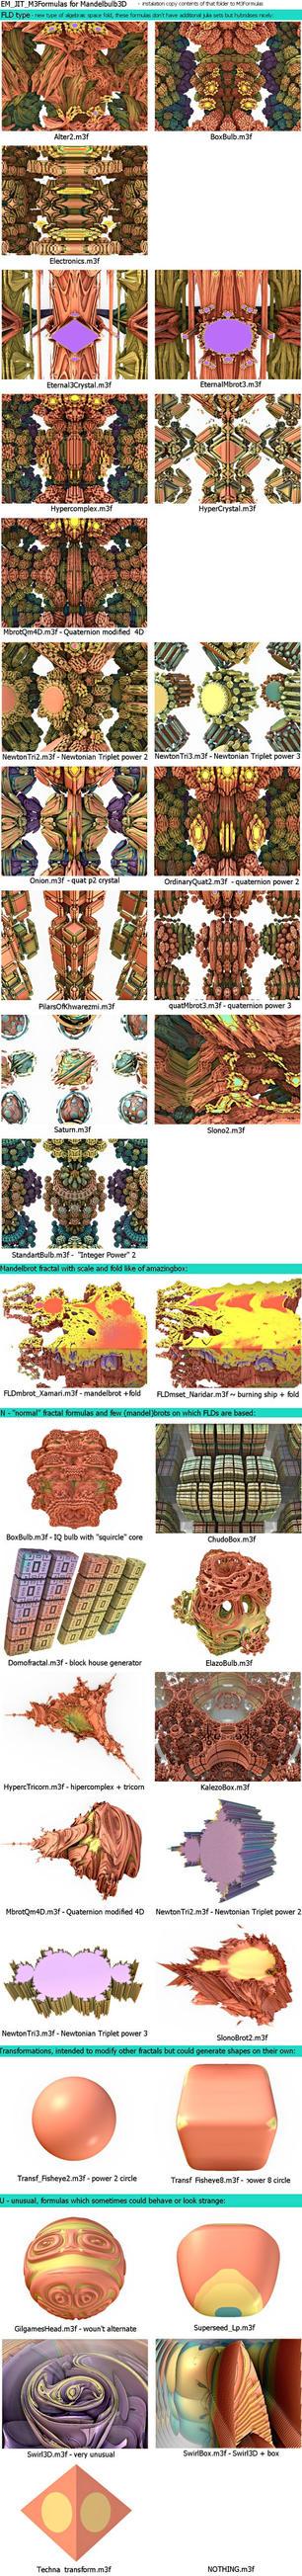 EM_JIT_M3Formulas example images for M3D, official by Edo555